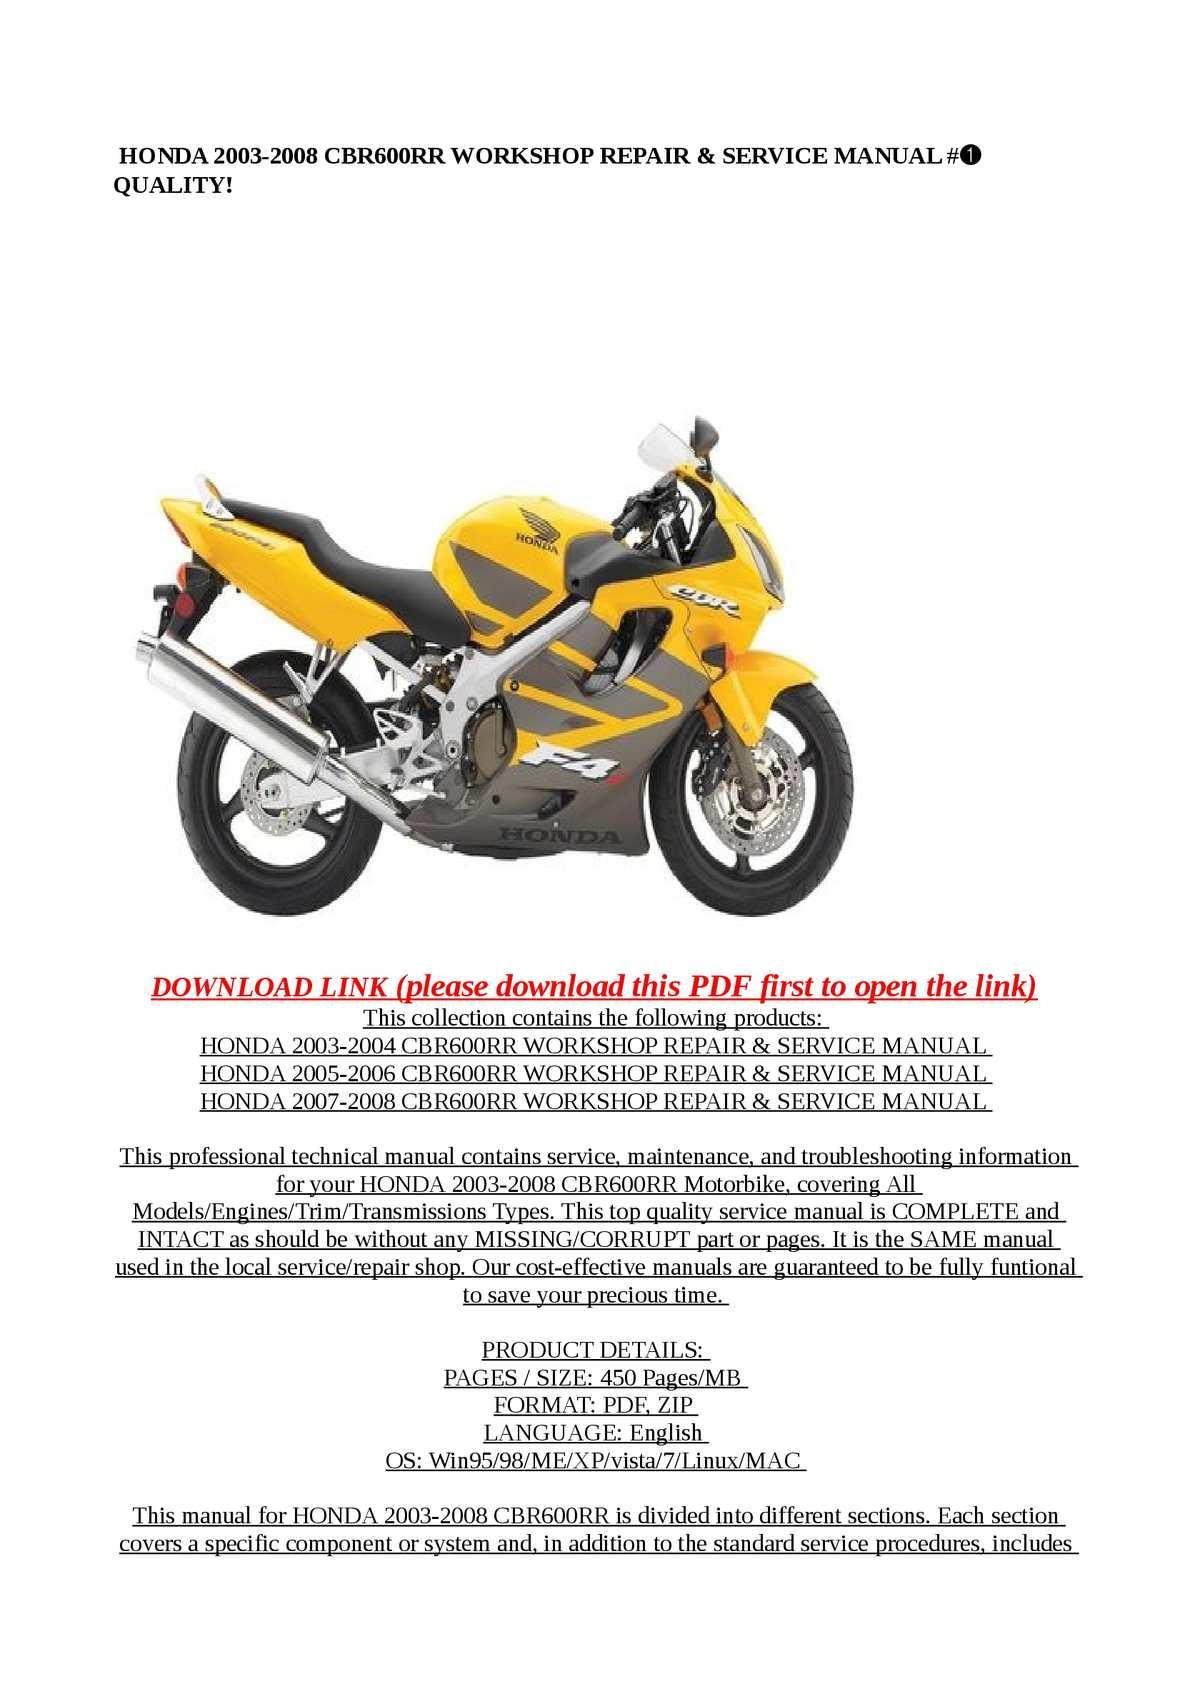 Calamo Honda 2003 2008 Cbr600rr Workshop Repair Service Manual 2005 Cbr 600 Rr Color Wiring Diagram Quality